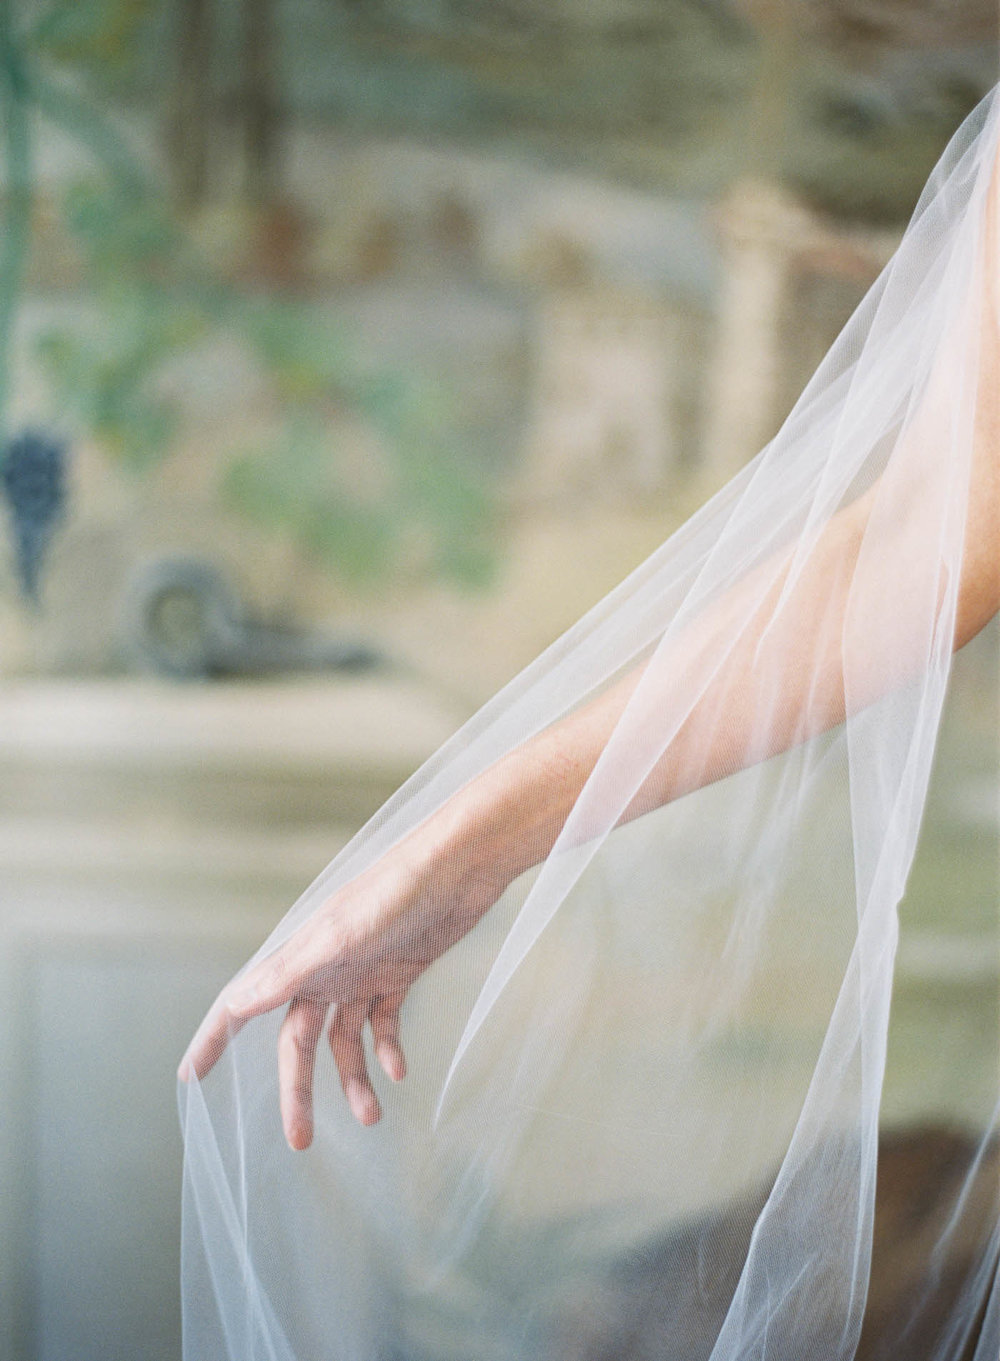 Villa_Cetinale_Wedding-15-Jen_Huang-ElanJacob-150-Jen_Huang-007325-R1-002.jpg